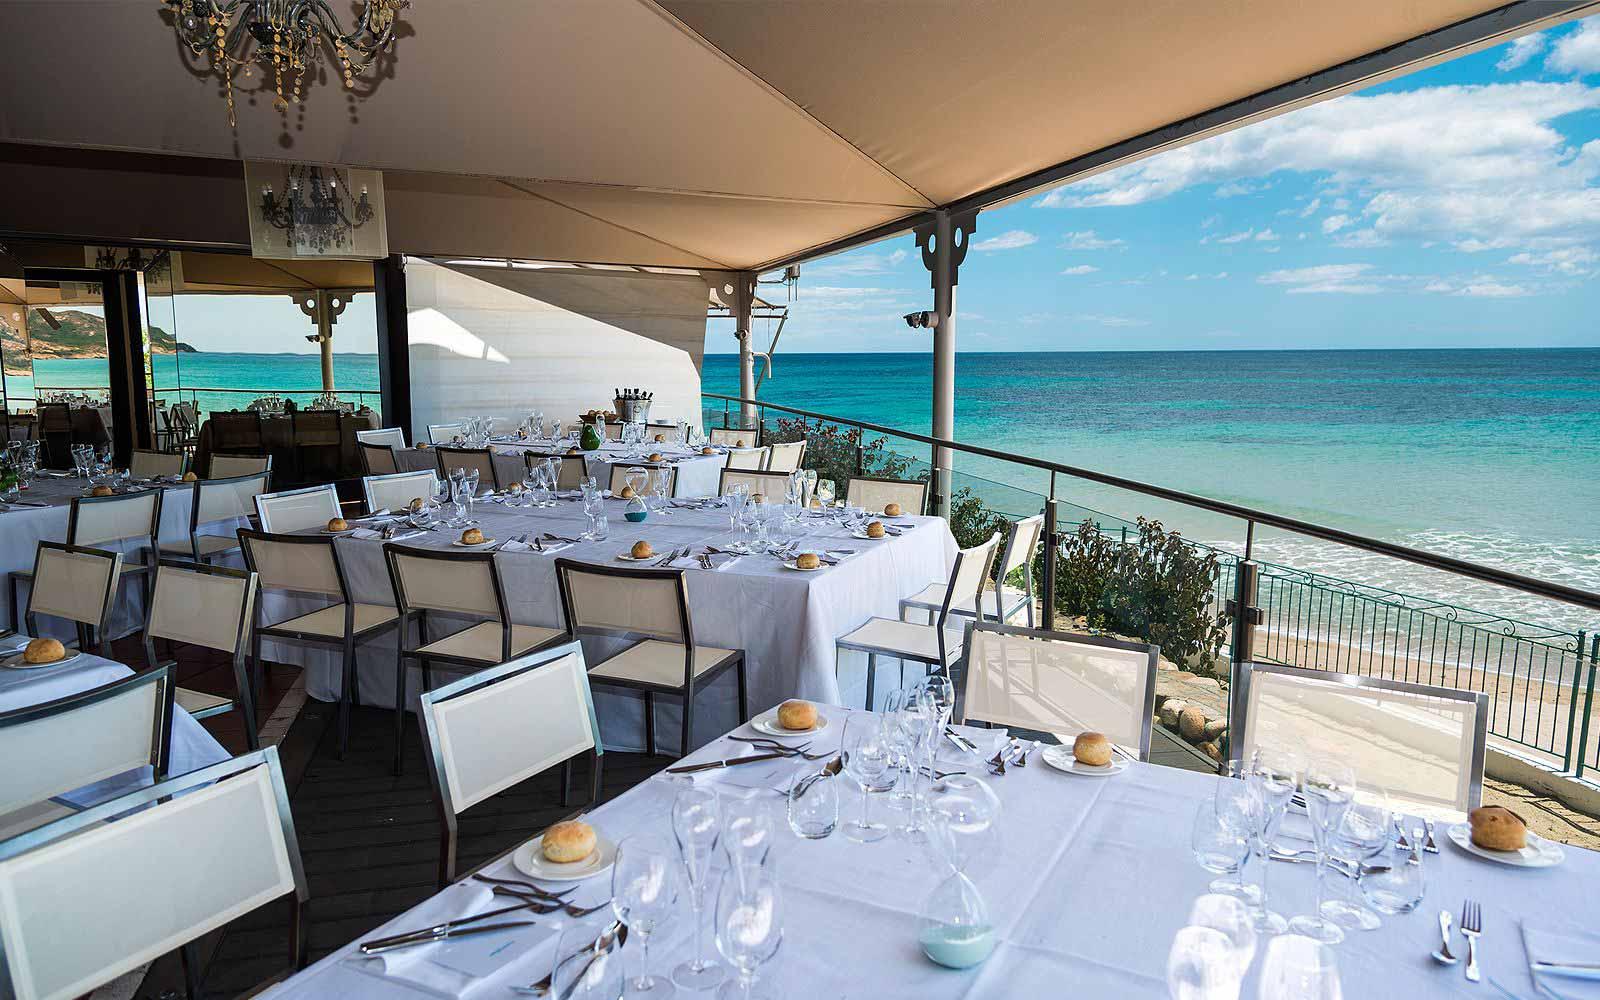 Gordon Ramsay Restaurant at the Forte Village Resort